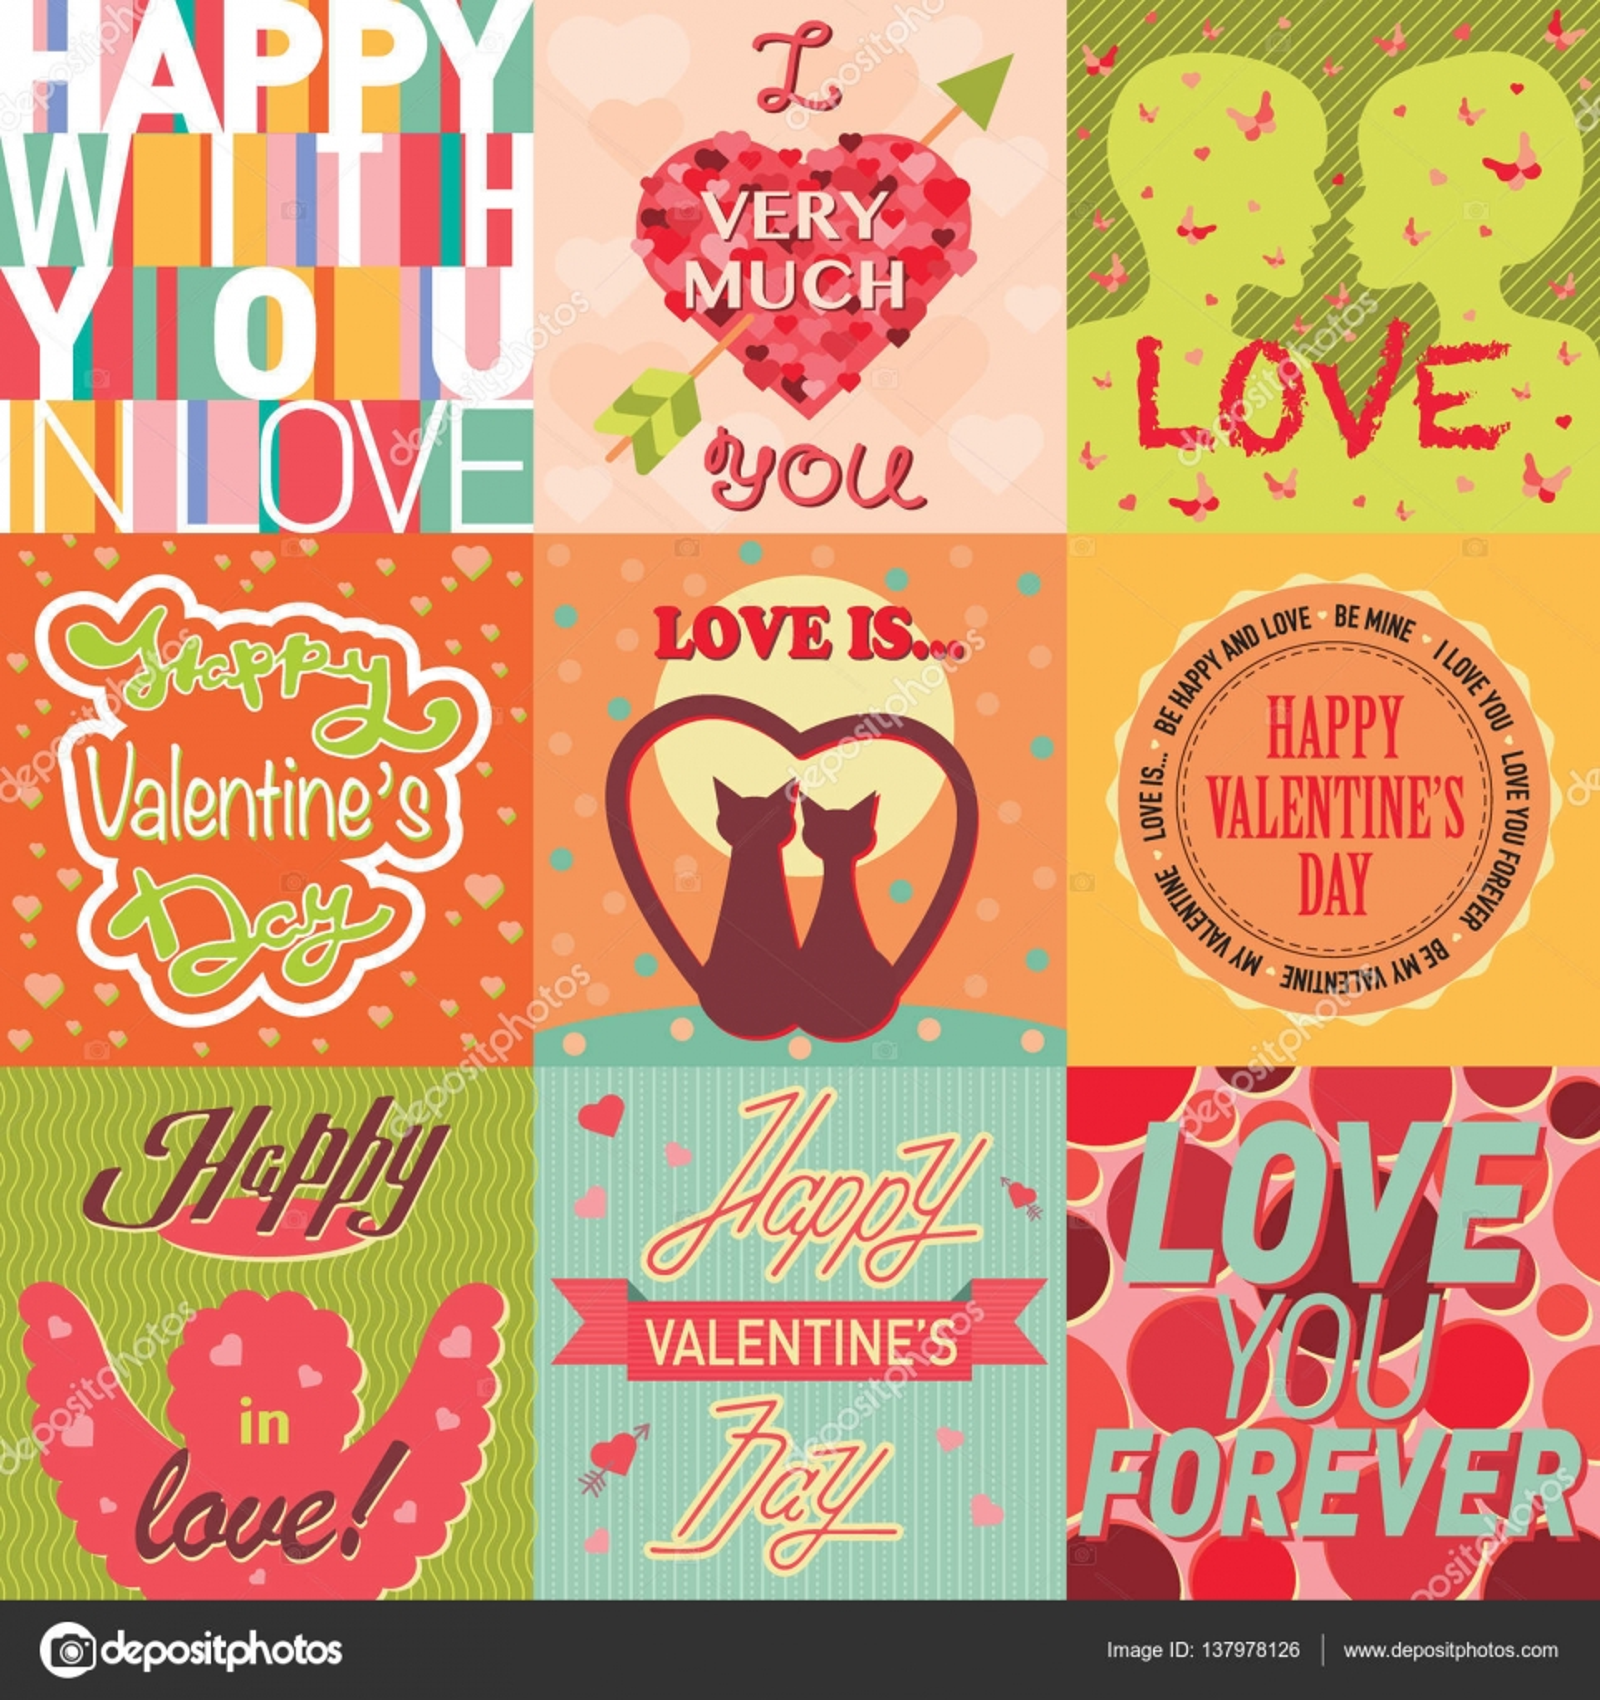 Valentinstag Karten Vorlage Vektor — Stockvektor © VectorShow #137978126